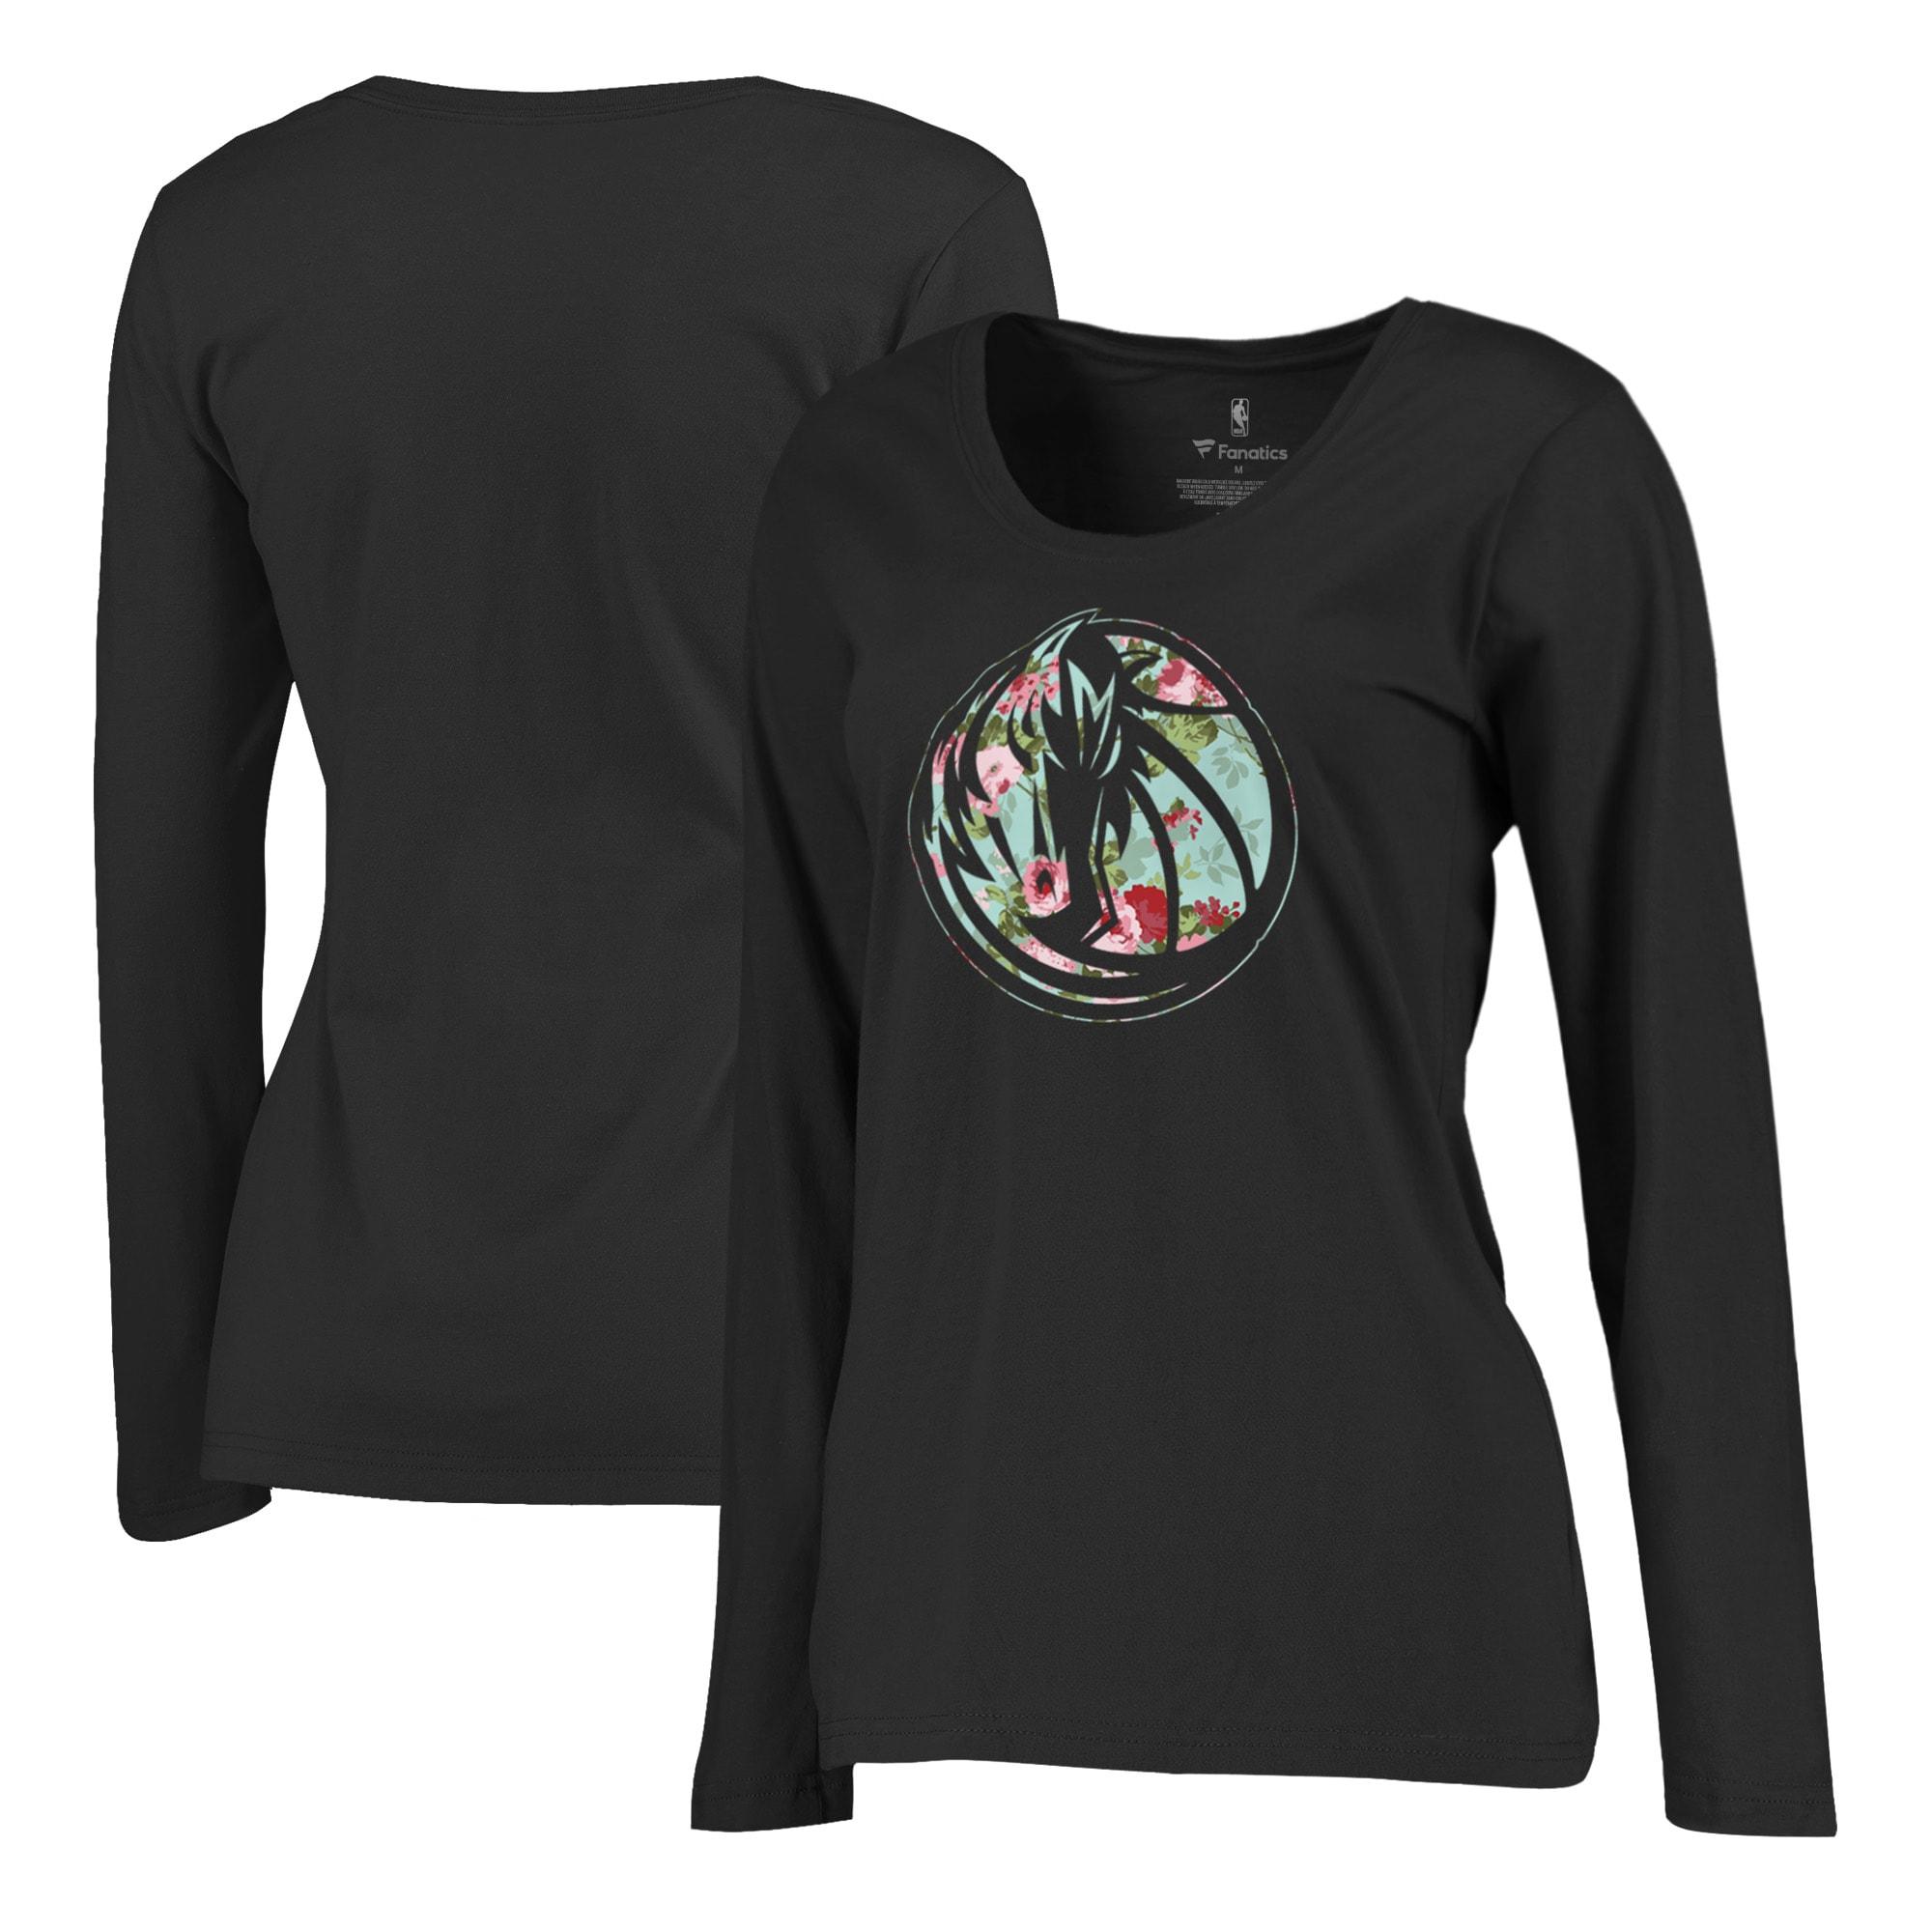 Dallas Mavericks Fanatics Branded Women's Lovely Plus Size Long Sleeve T-Shirt - Black